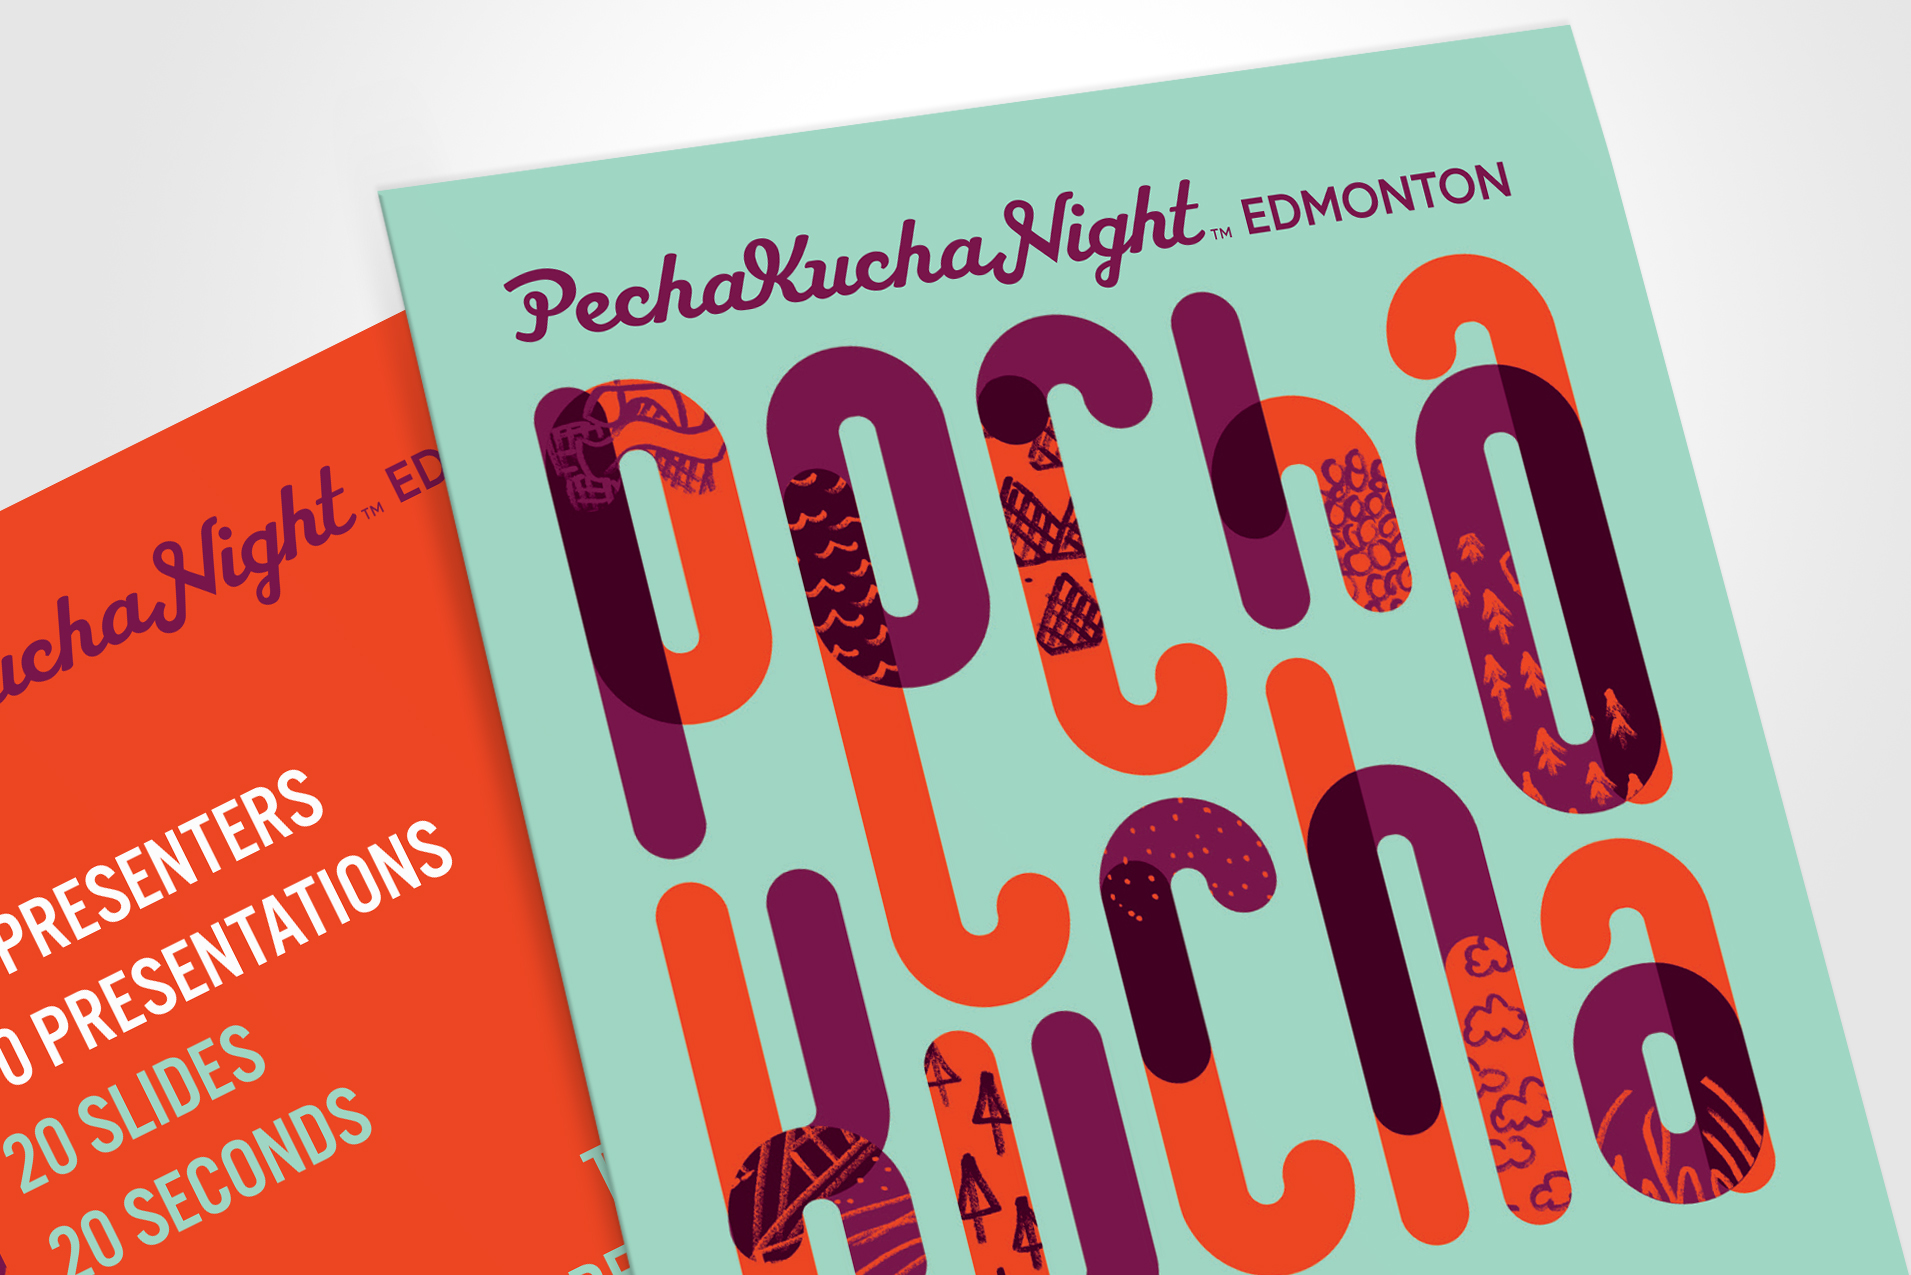 Natasia Designs Edmonton Freelance Graphic and Website Designer Illustrator Hand-Letterer Pecha Kucha Night Edmonton